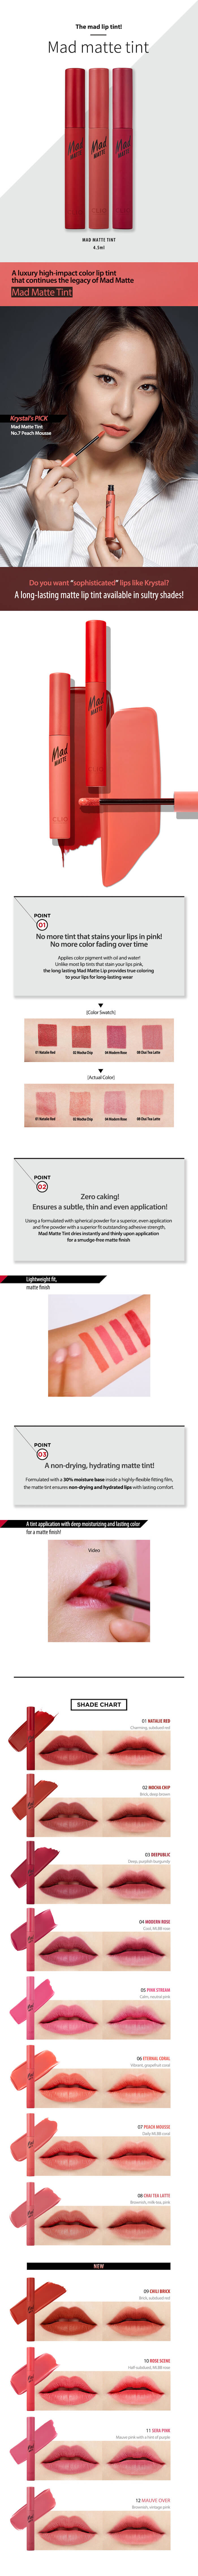 CLIO Mad Velvet Tint 3.8g